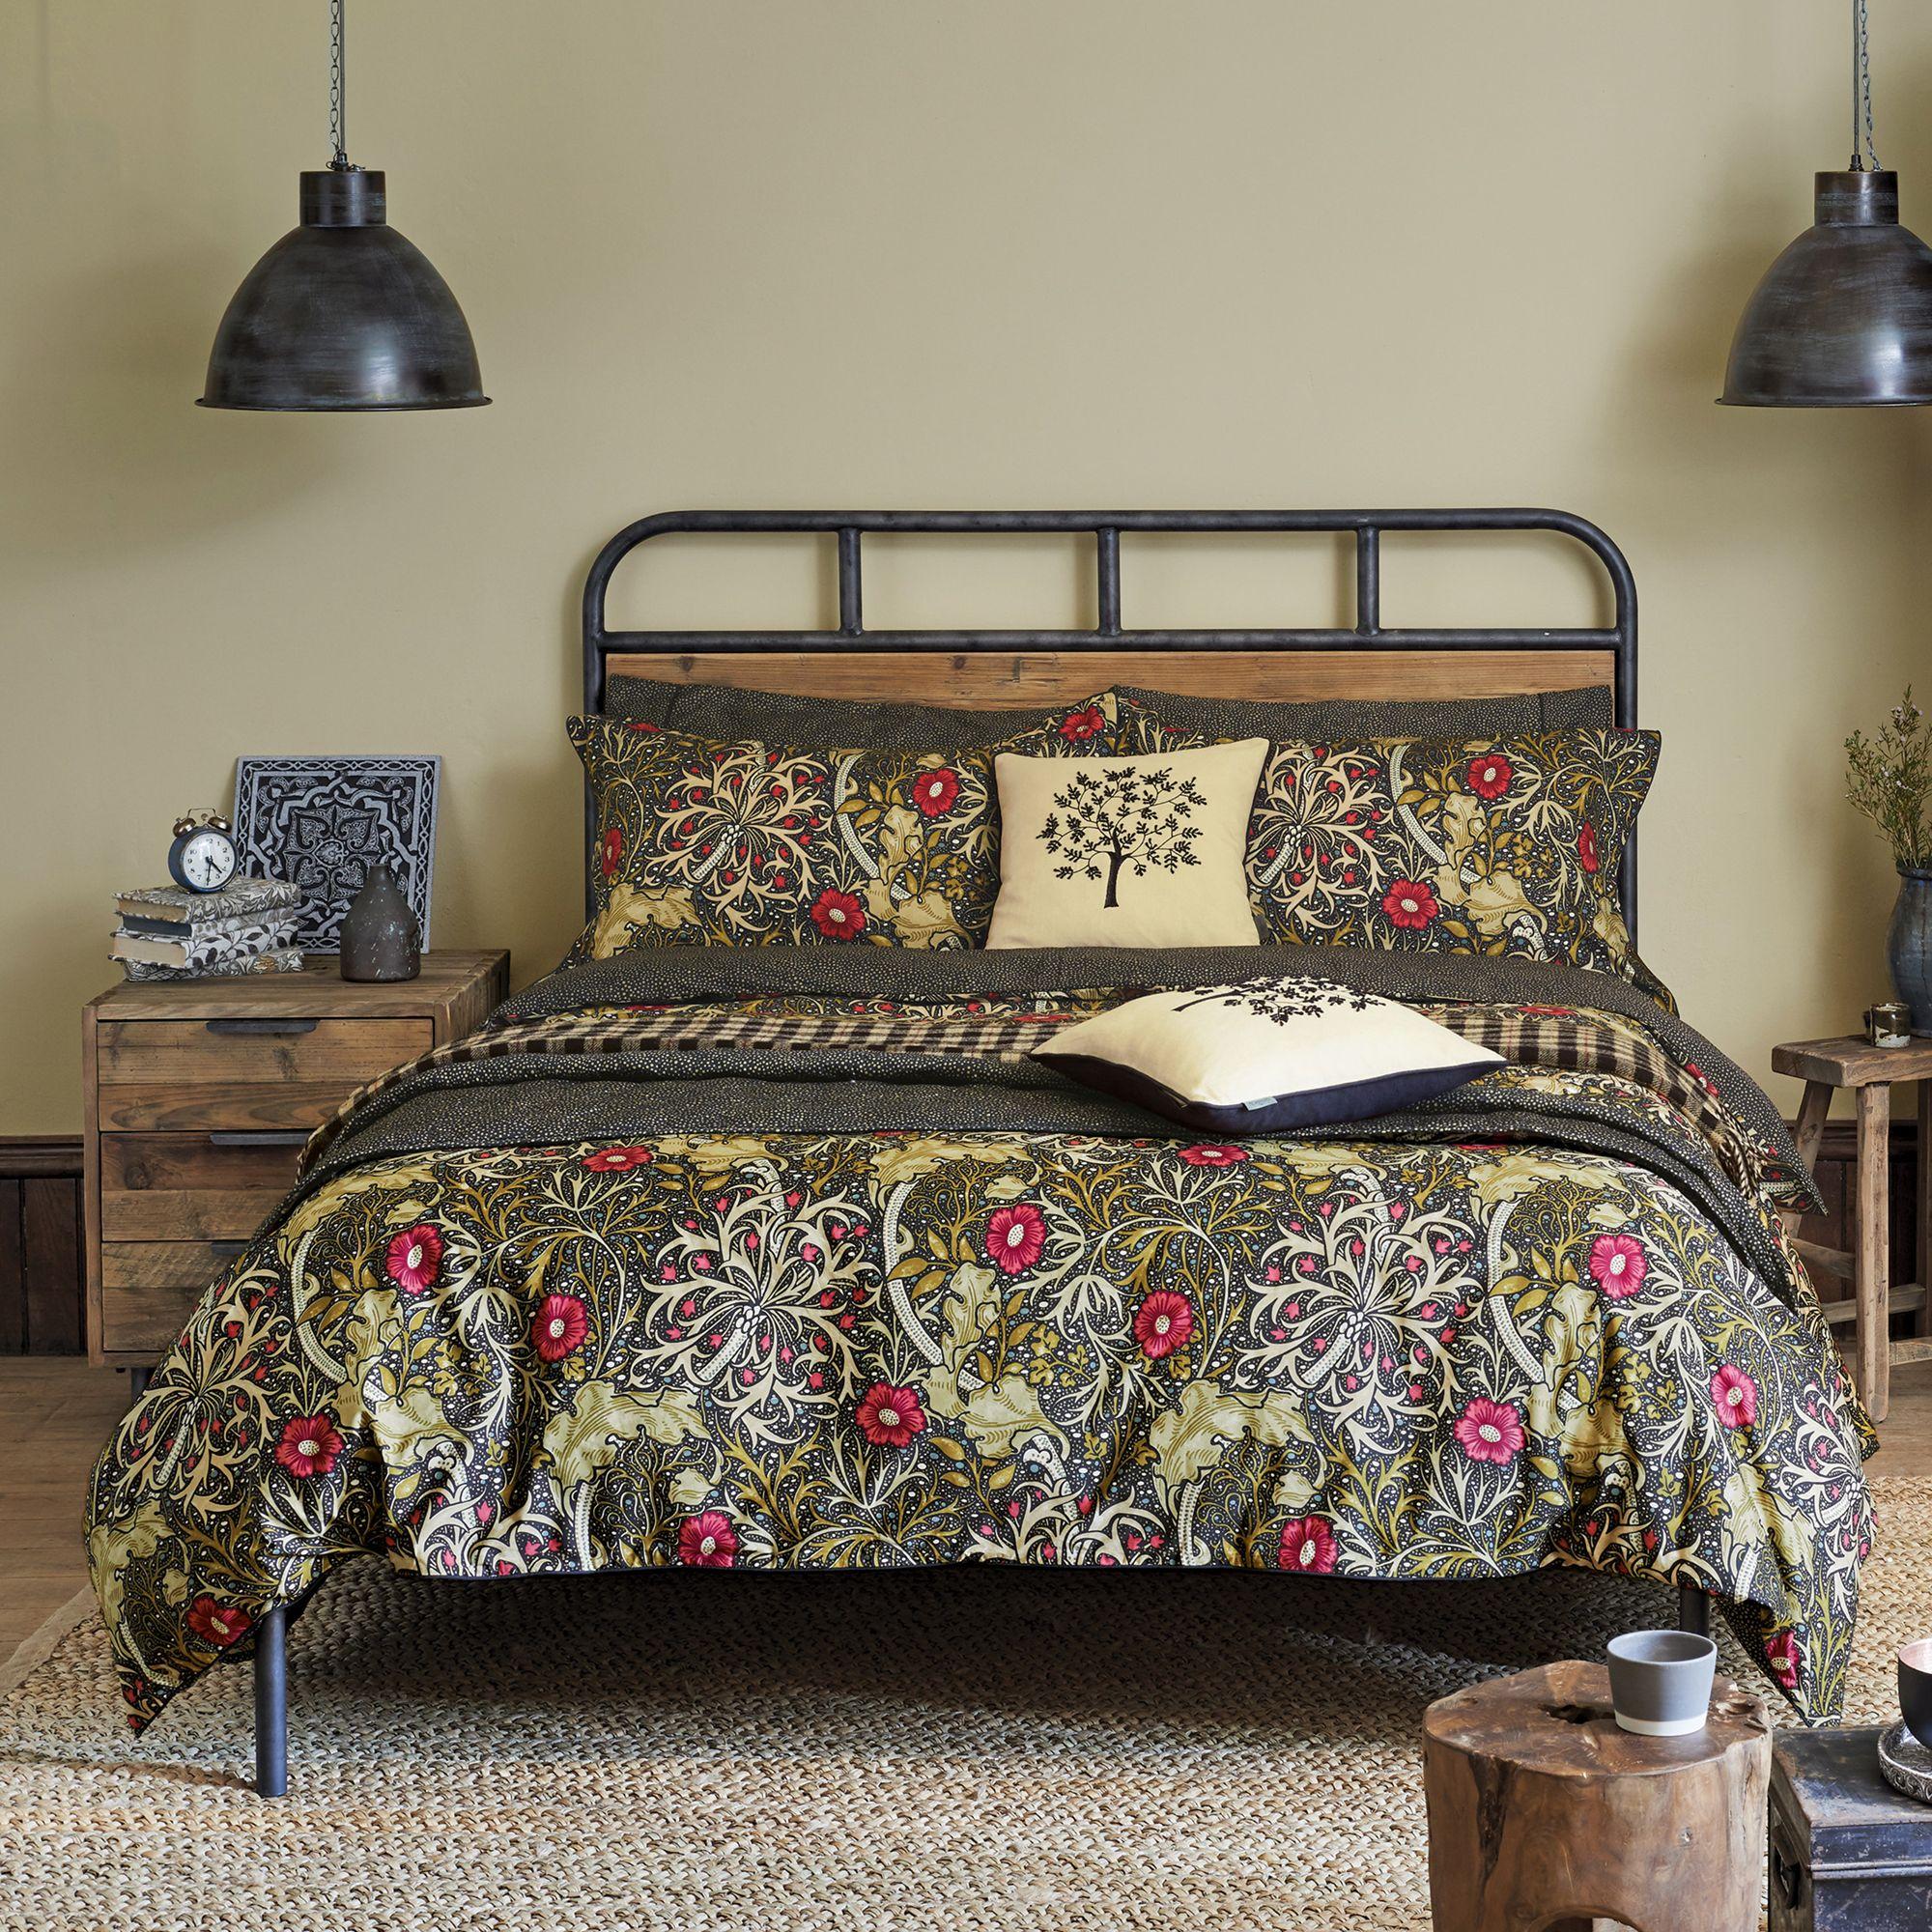 Morris & Co Morris & Co Seaweed Bedding